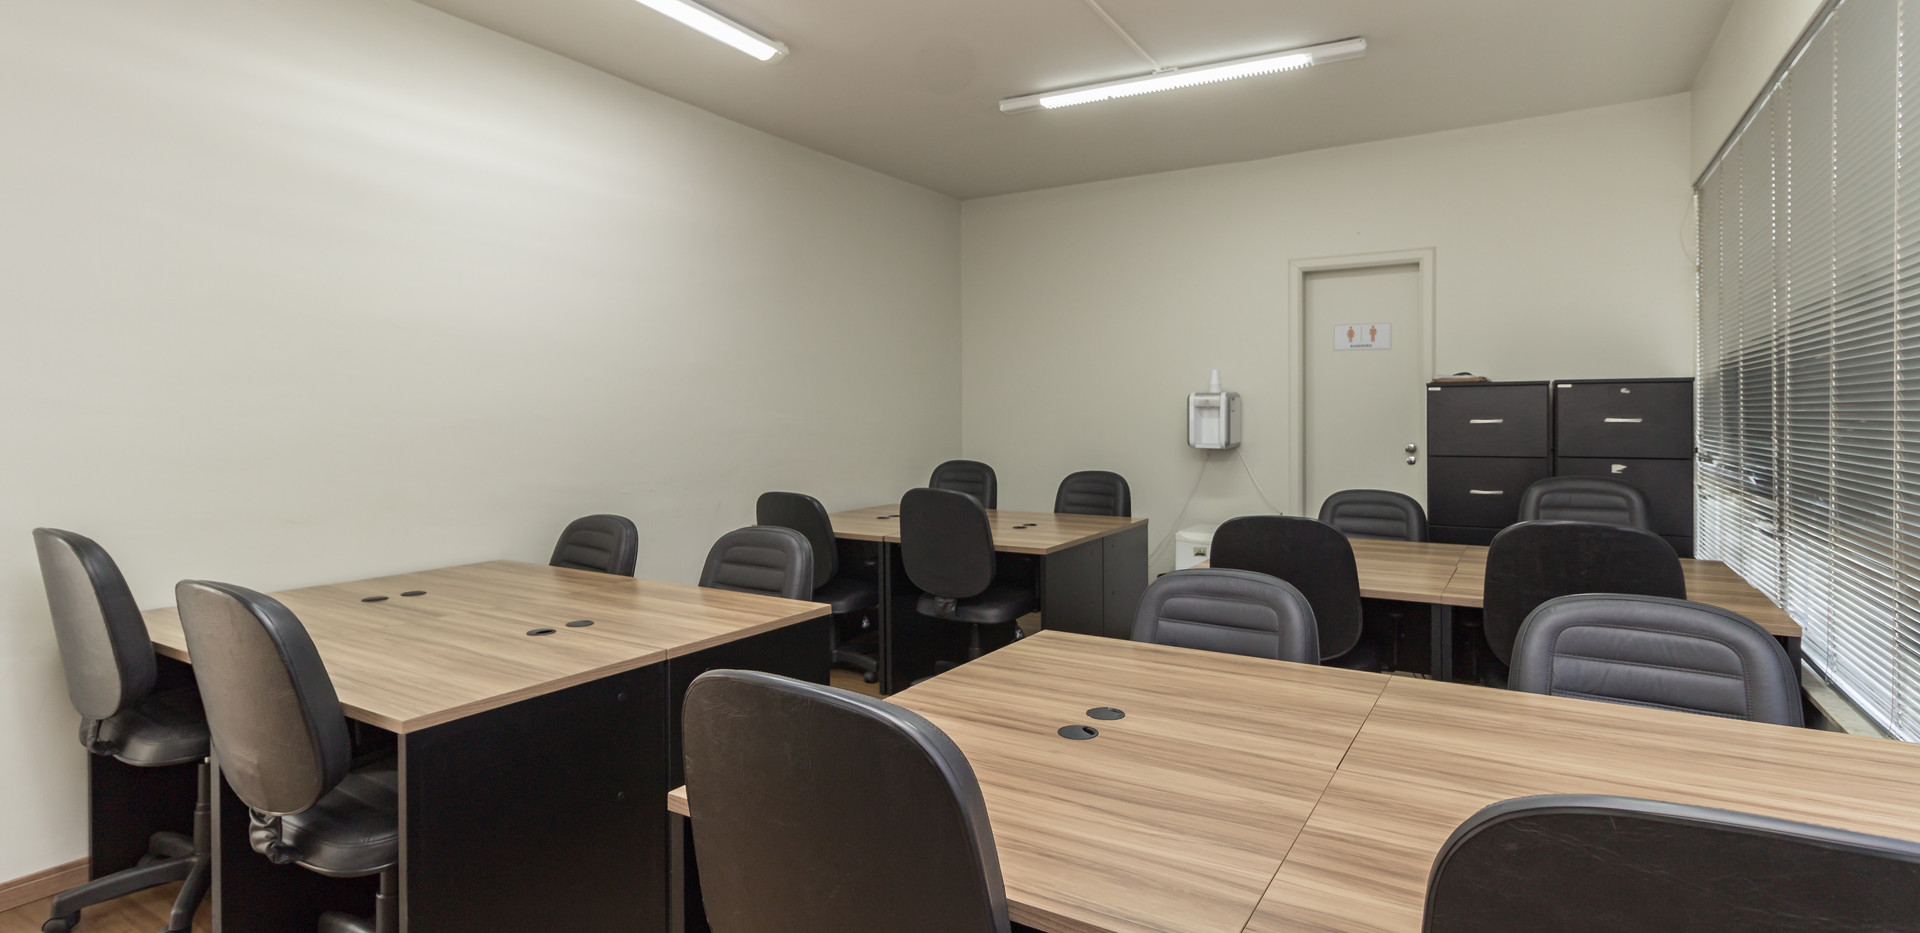 Sala de Aula III - Corporate.jpg